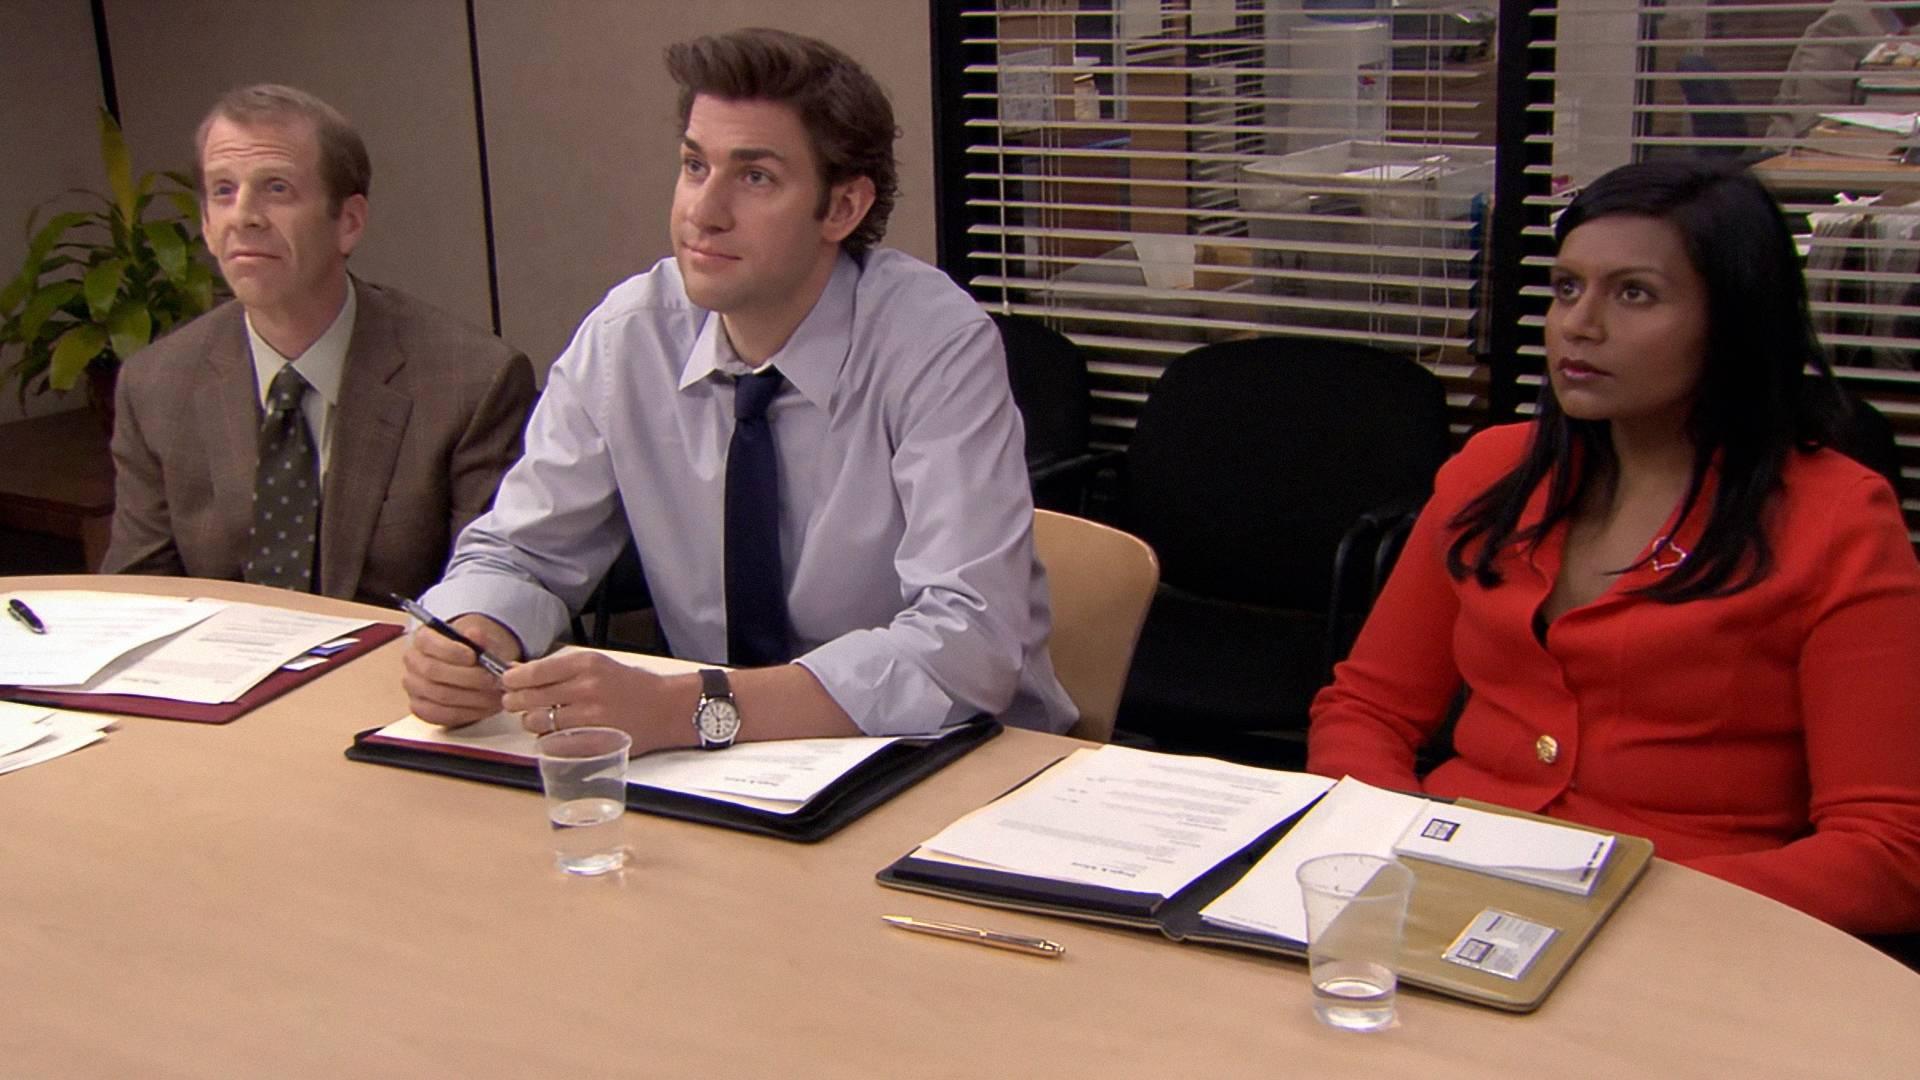 The Office Season 7 Episode 27